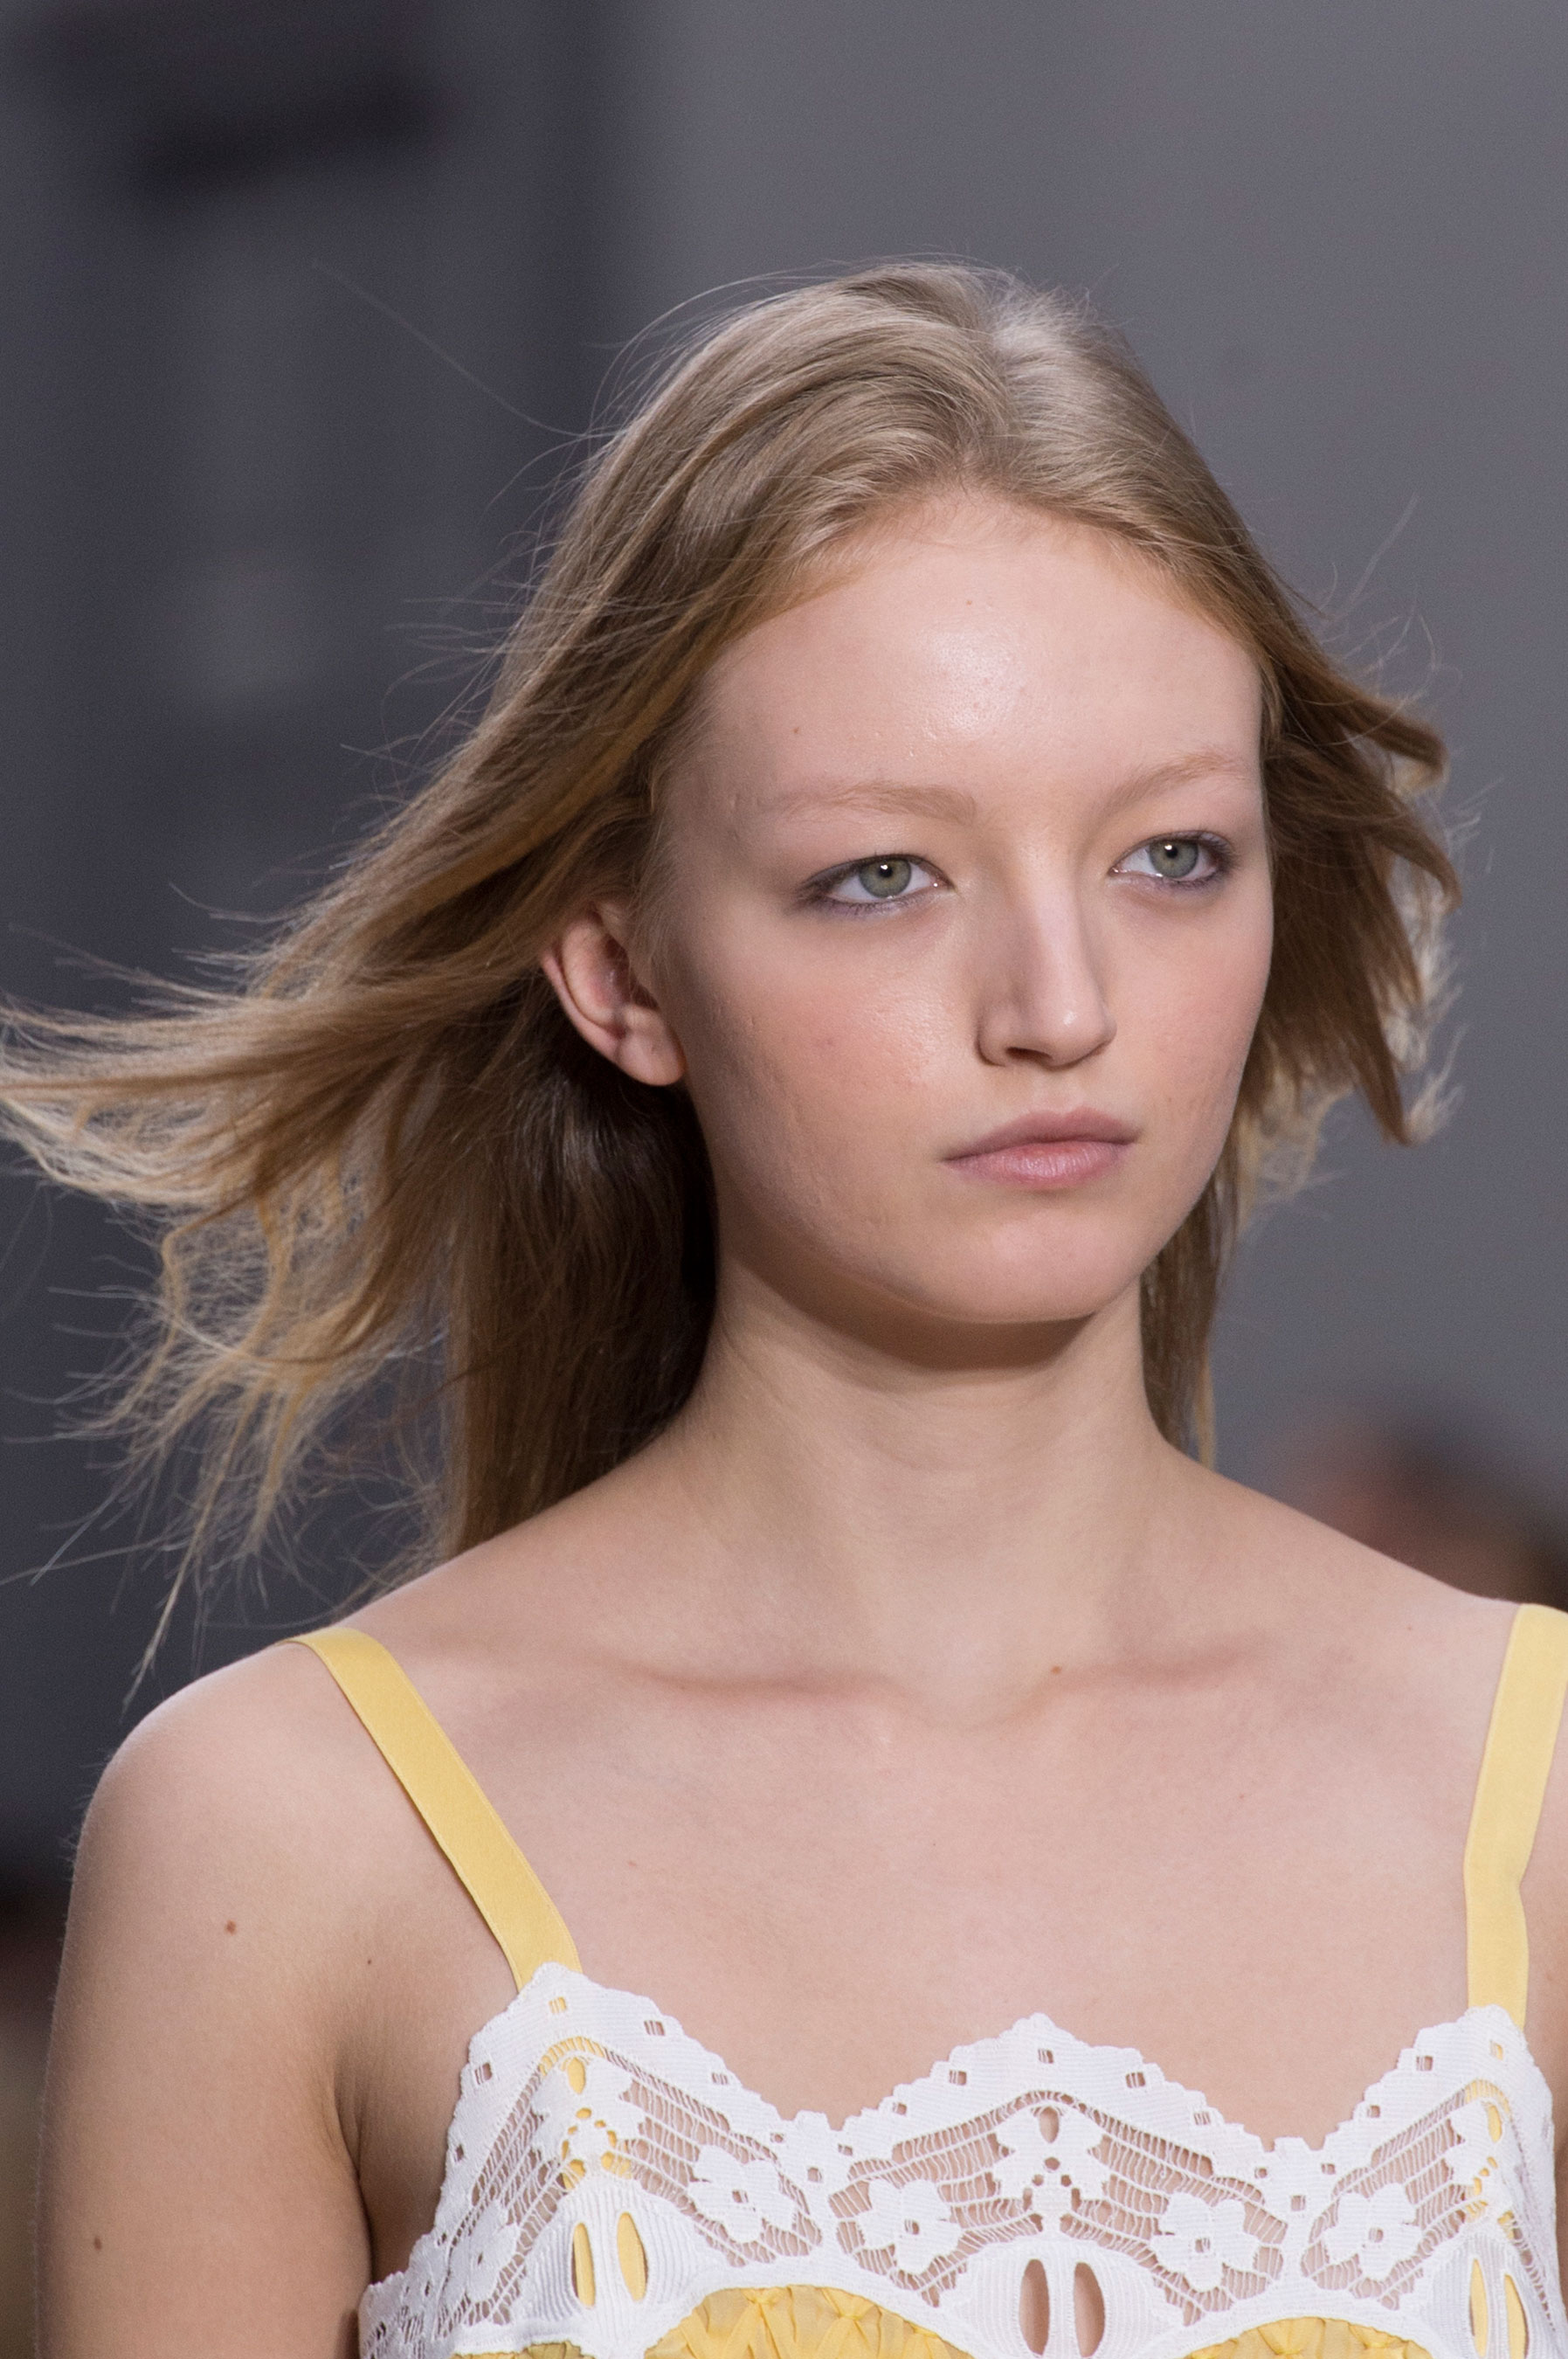 Chloe-spring-2016-runway-beauty-fashion-show-the-impression-10